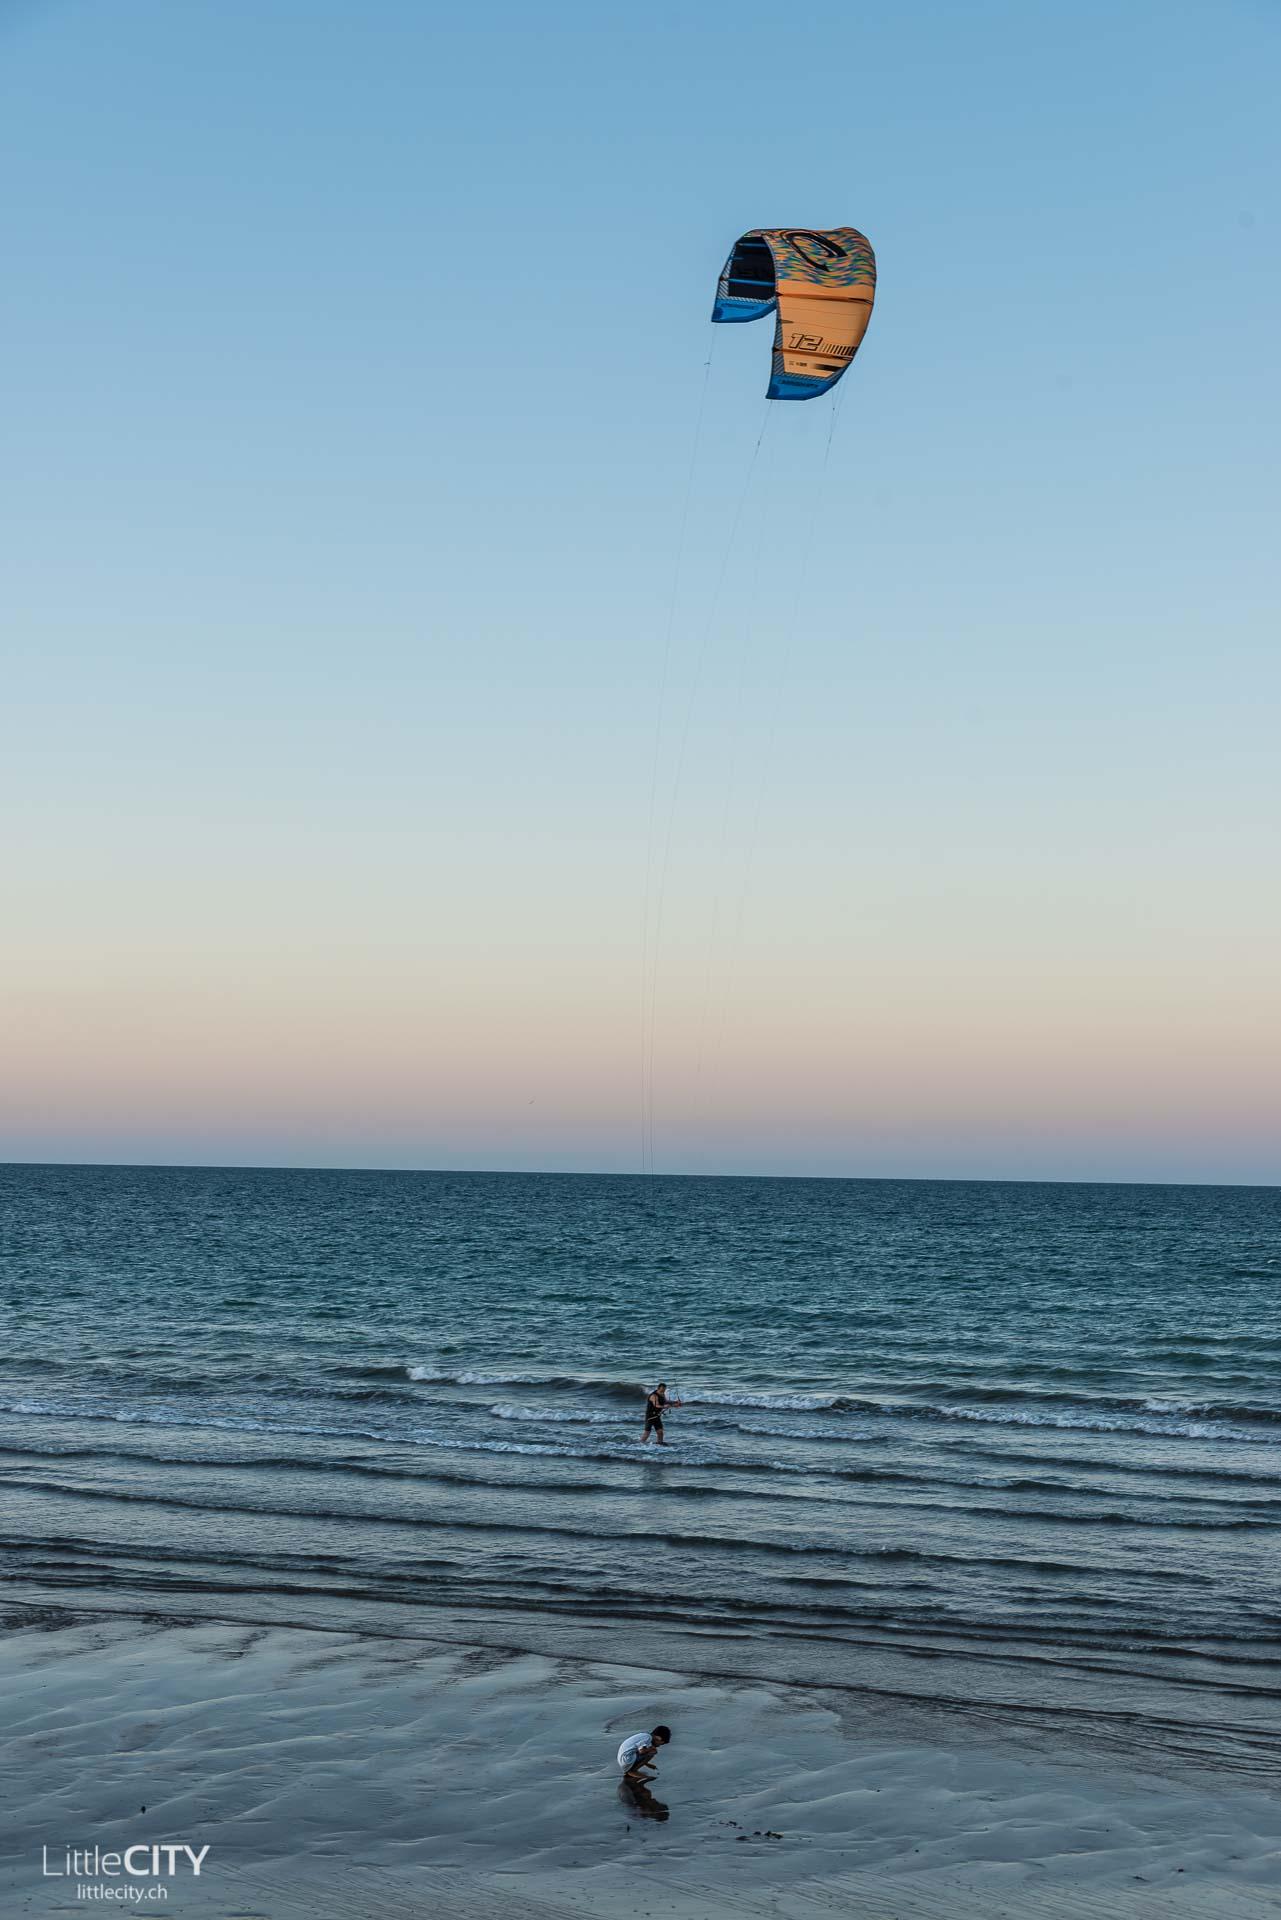 oman-azaiba-beach-fitesurf-school-2